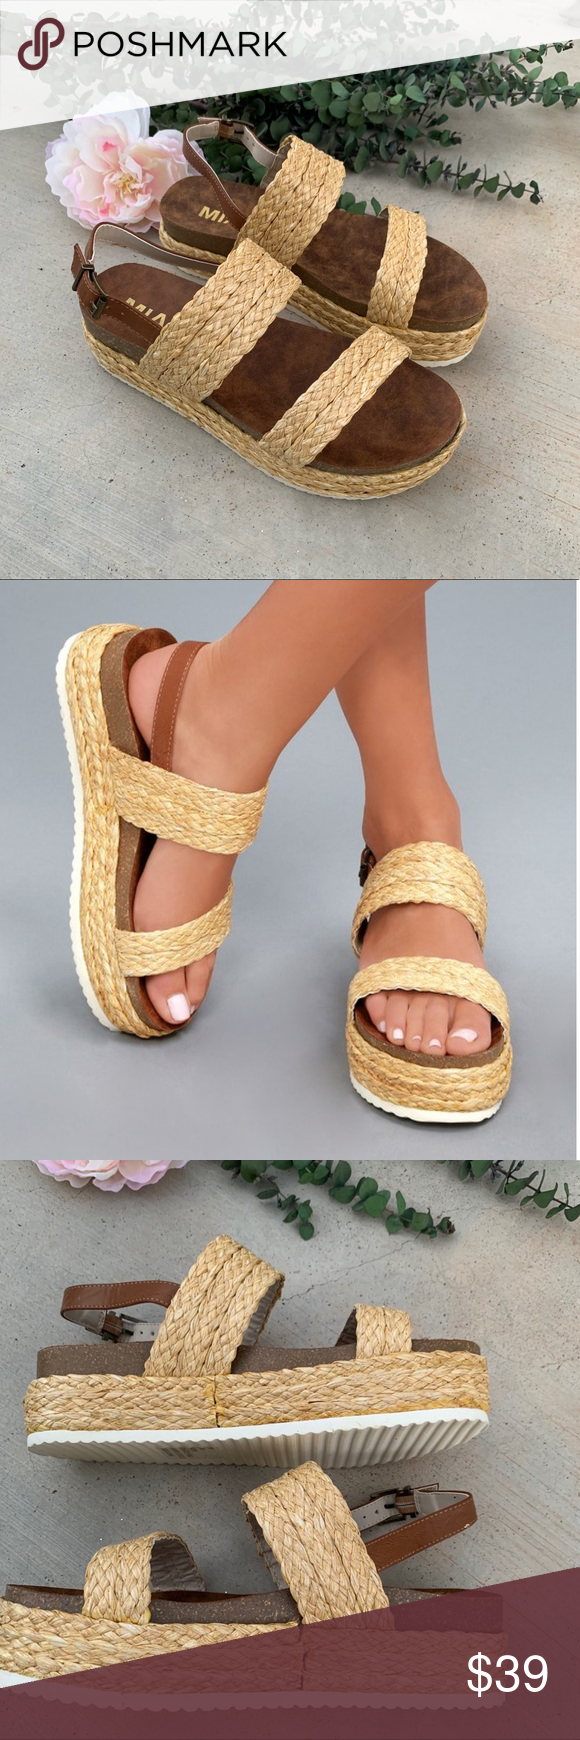 6b3e35d2f28 Mia Ava Raffia Platform Sandal Mia Ava Raffia Platform Sandal Color   Natural Ra Condition